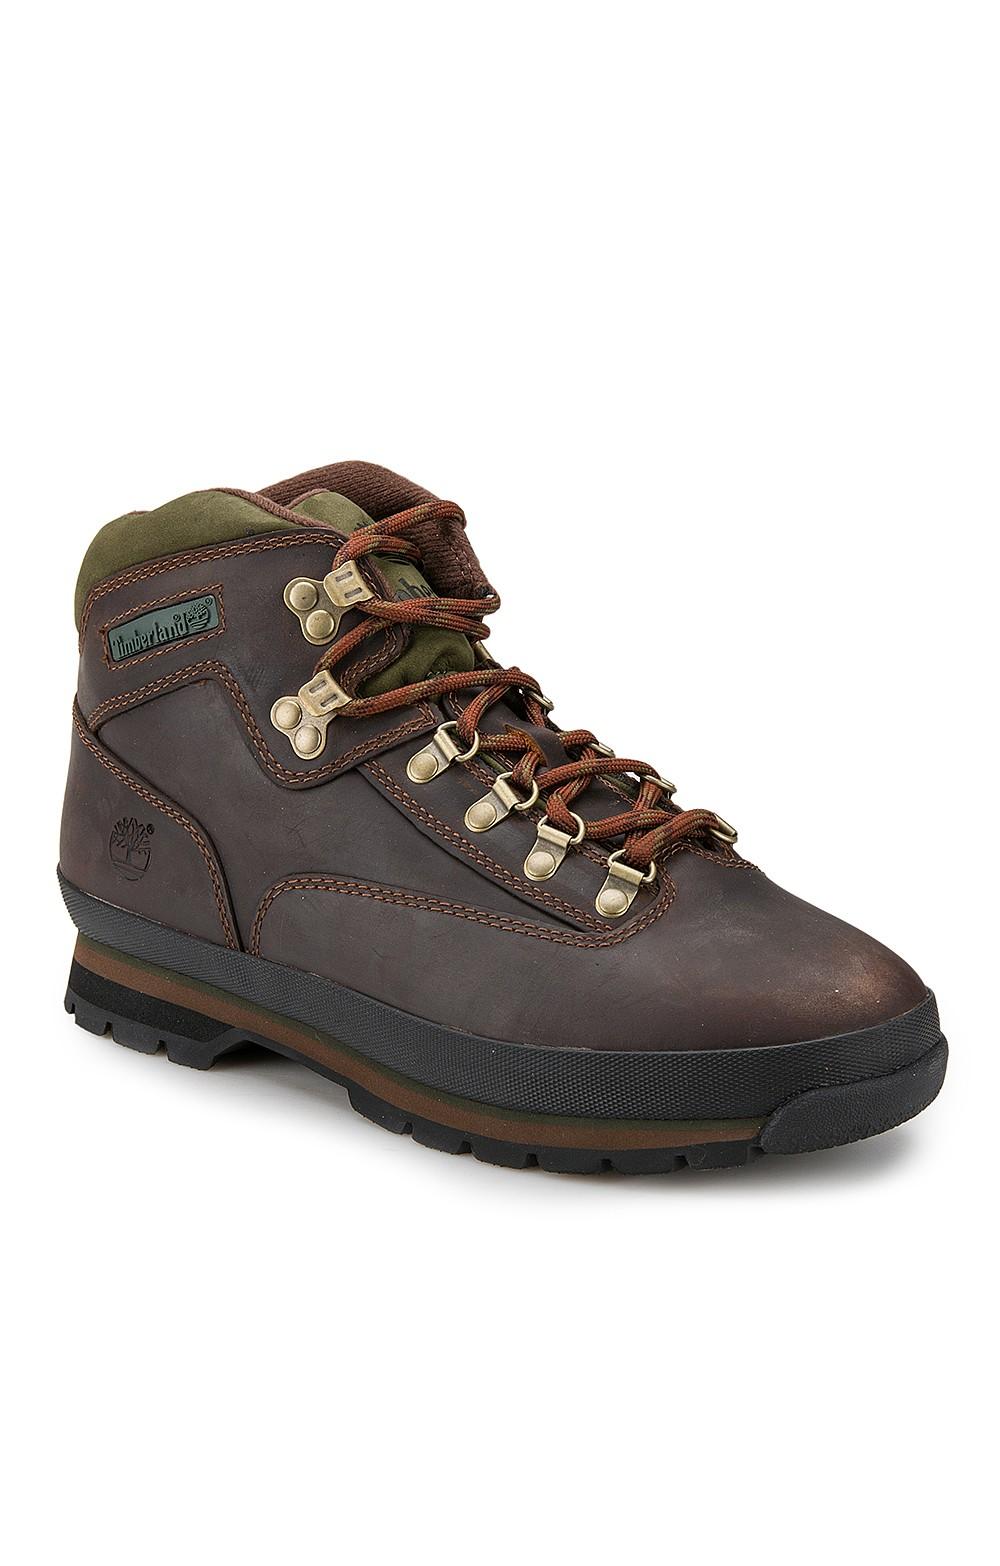 cebad2494c3 Mens Timberland Euro Hiker Boot